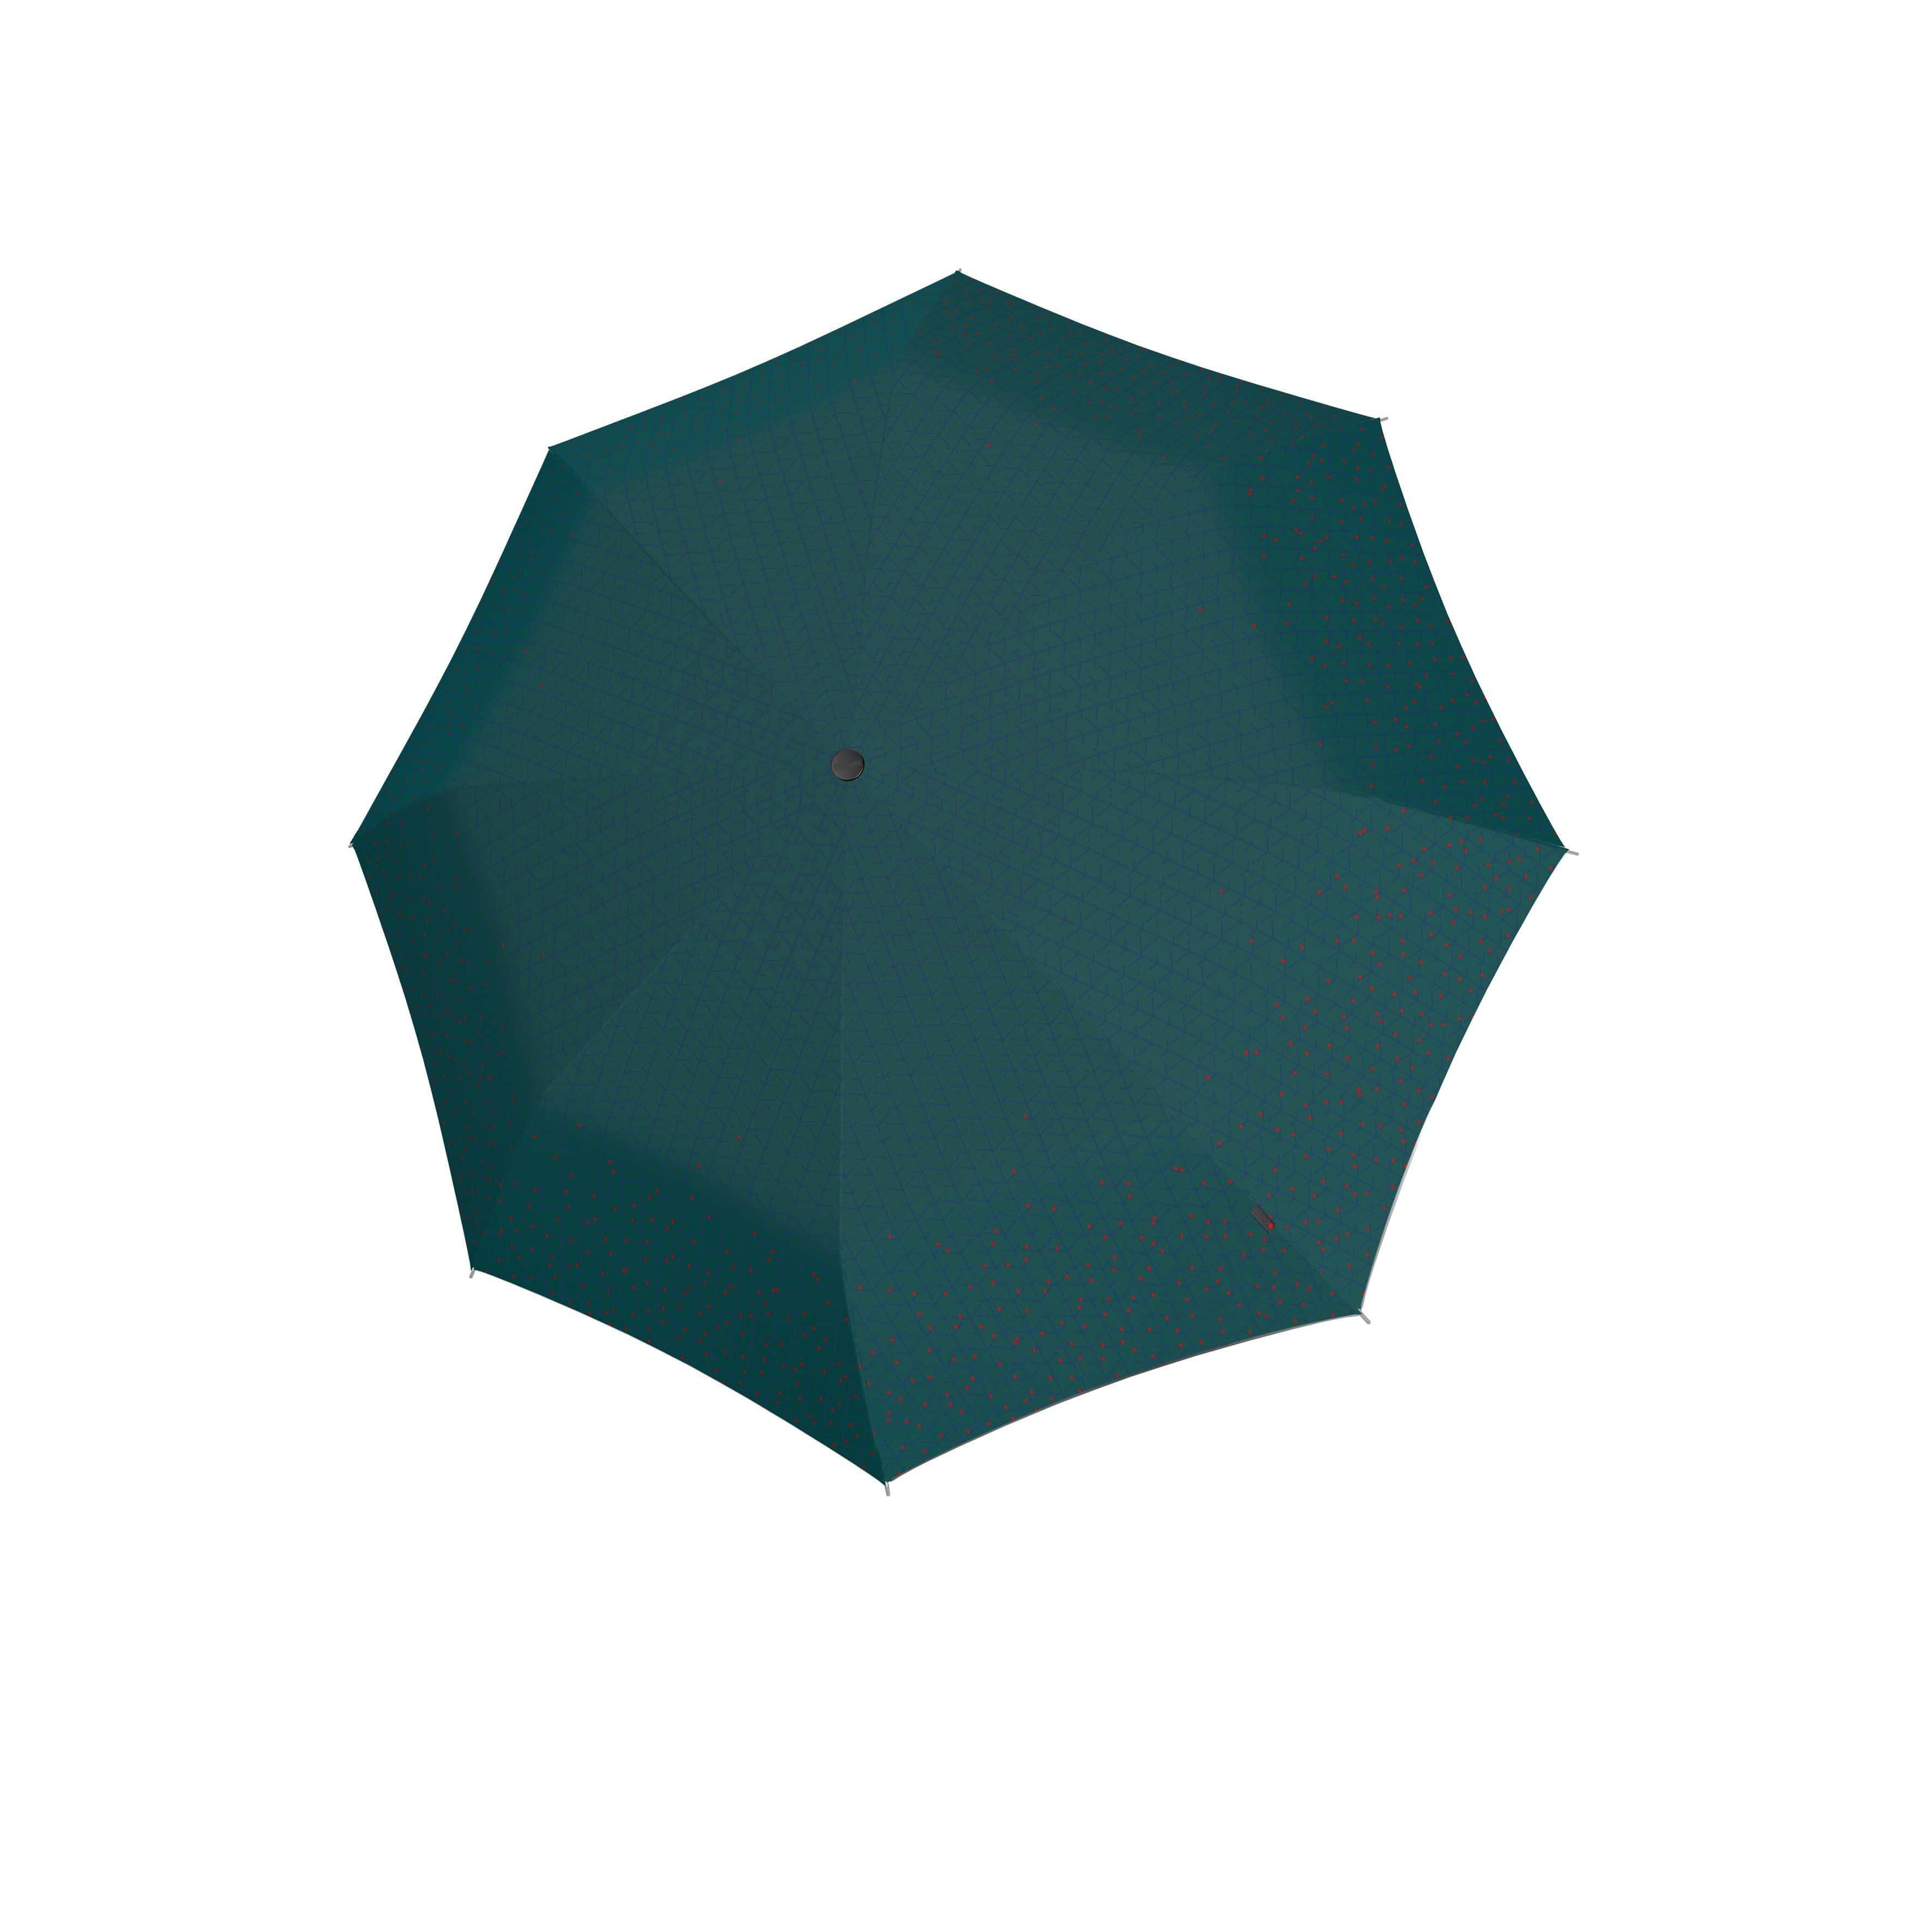 Knirps Umbrella Knirps T.200 medium duomatic NUNO biru forest ecorepel with UV Protection